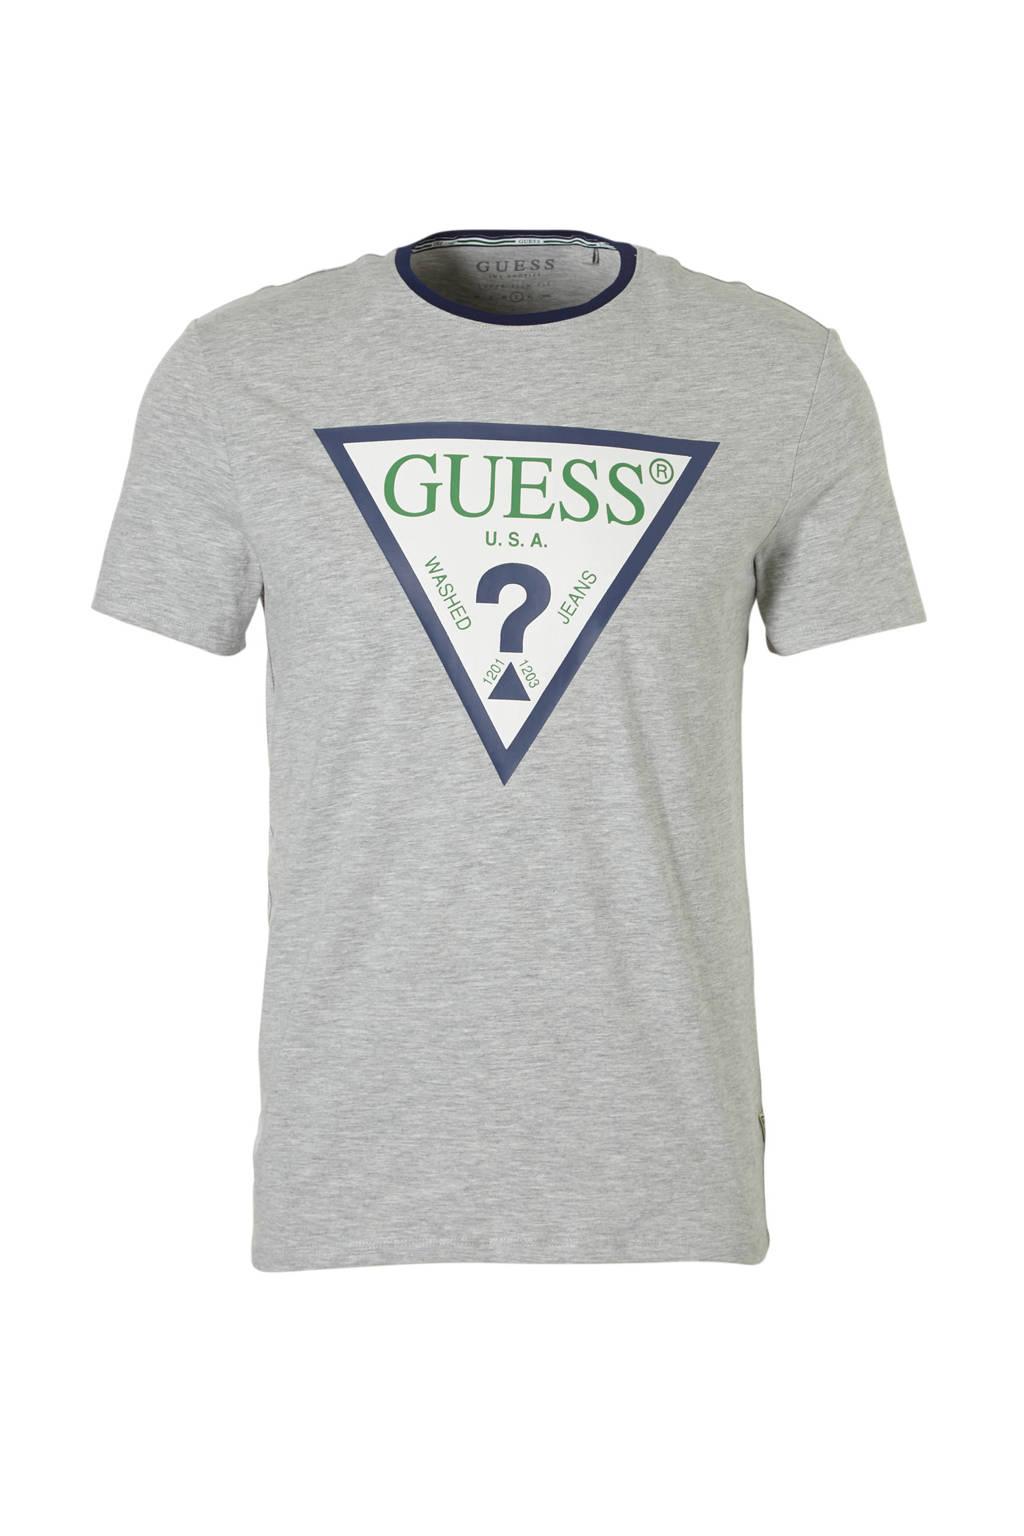 GUESS gemêleerd T-shirt met logo grijs, Grijs